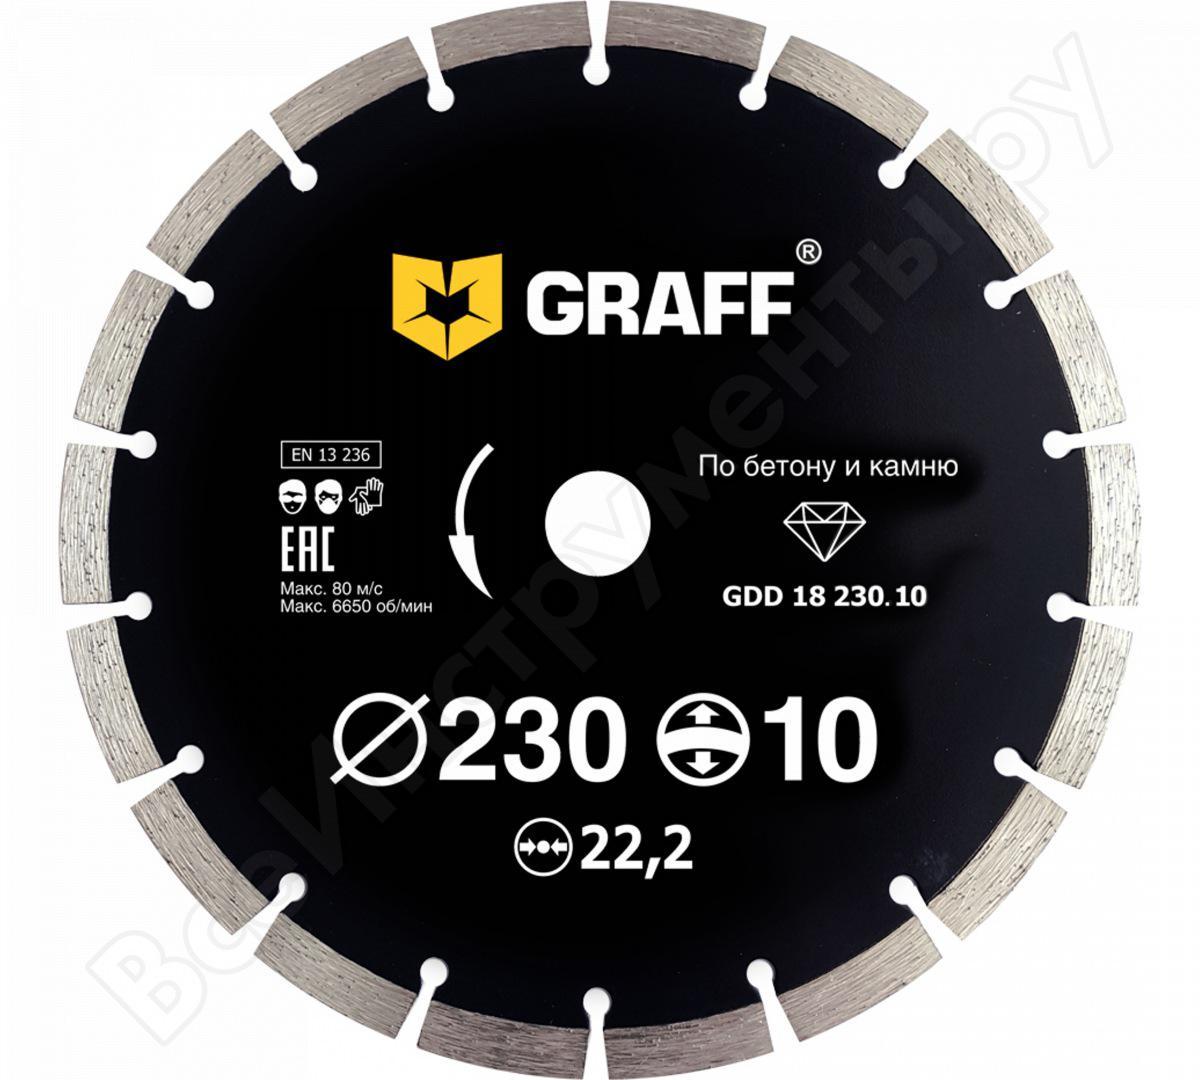 Круг алмазный Graff (gdd 18 230.10) Ф230х22мм по бетону цена и фото